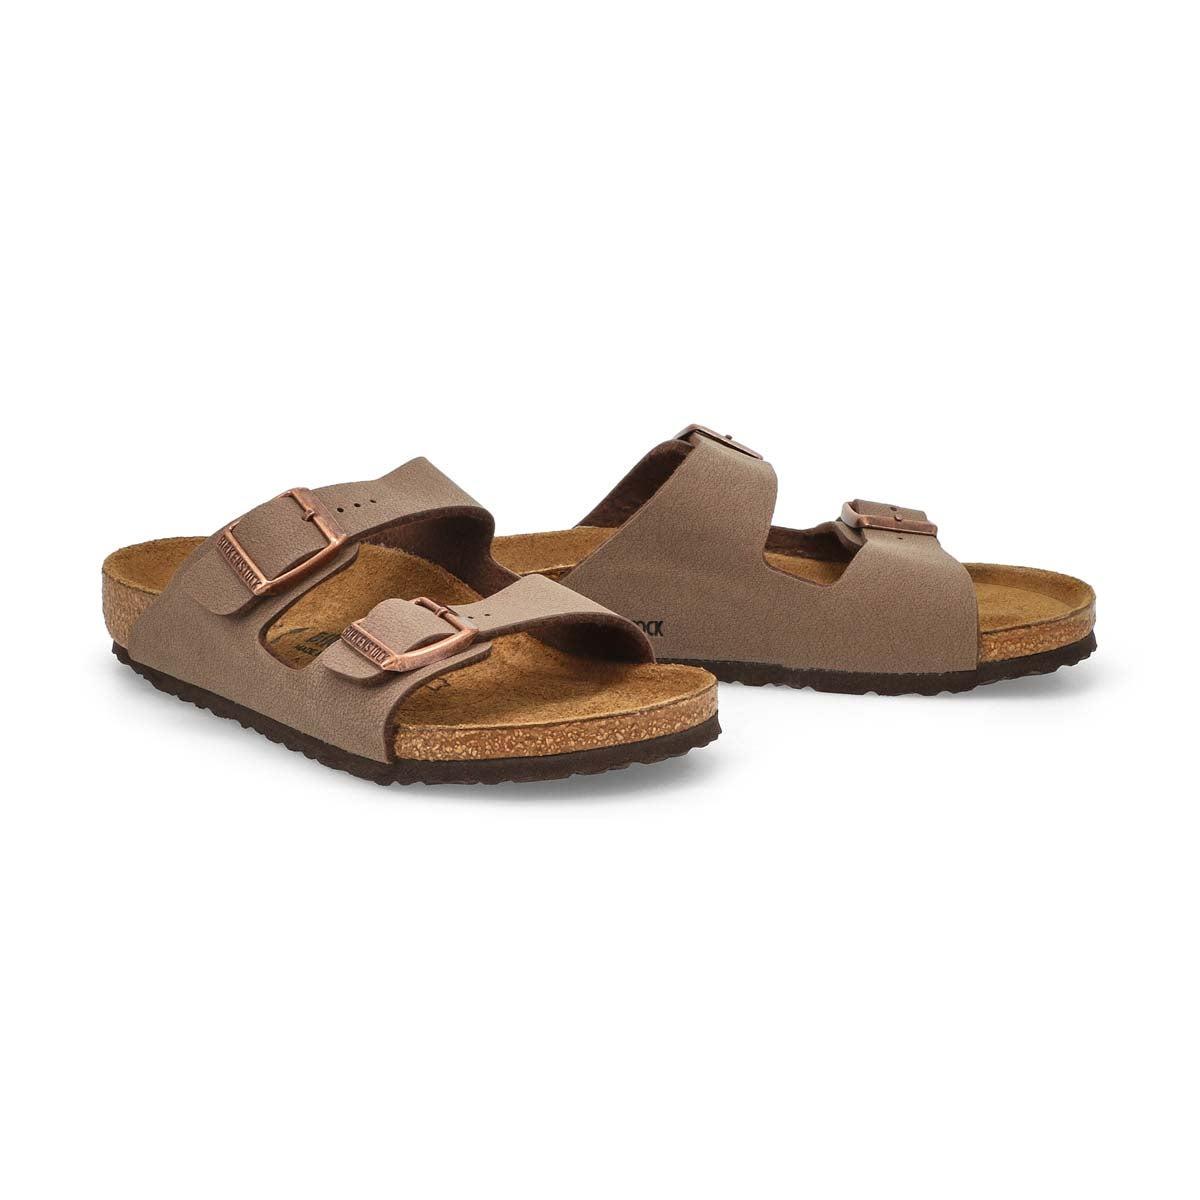 Sandale moka ARIZONA, enf -Étroite